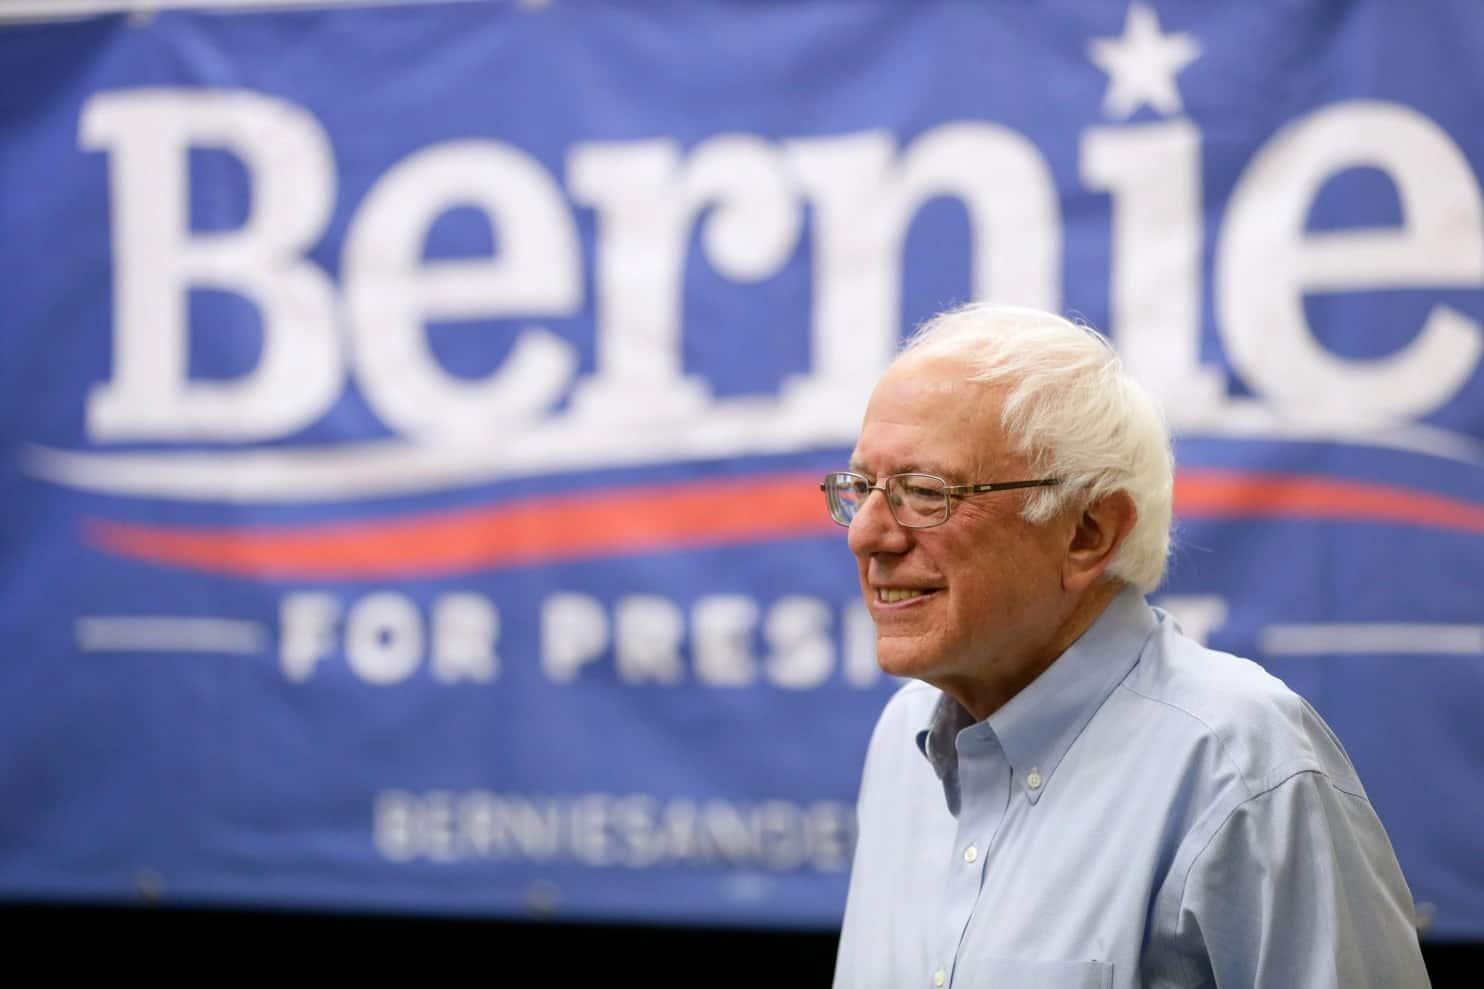 Bernie's Big Ideas About Transforming American Politics